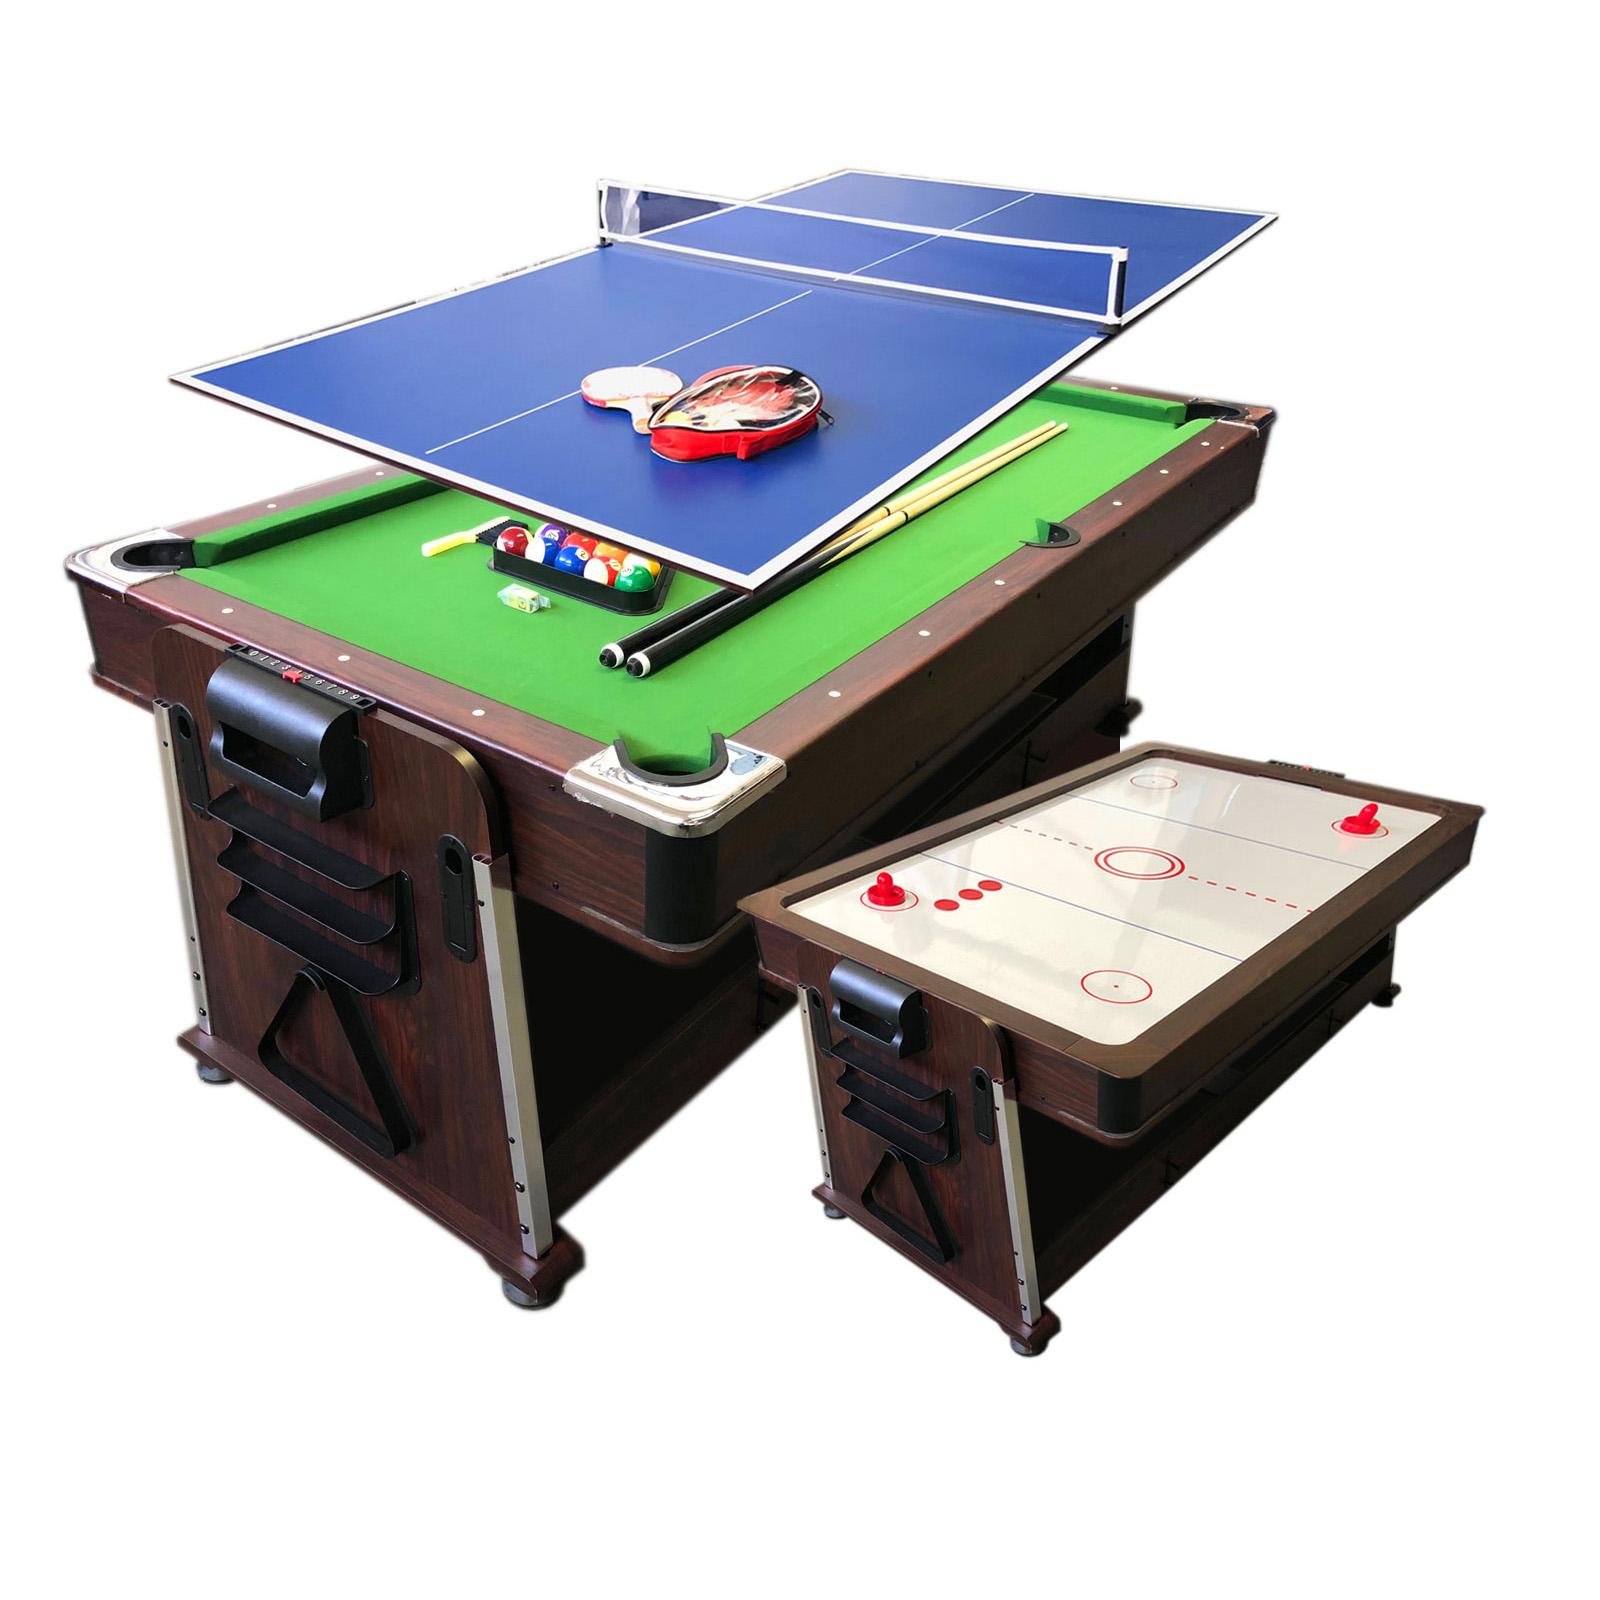 7ft Pool Table Multigame Billiards Air Hockey Table Tennis Mattew